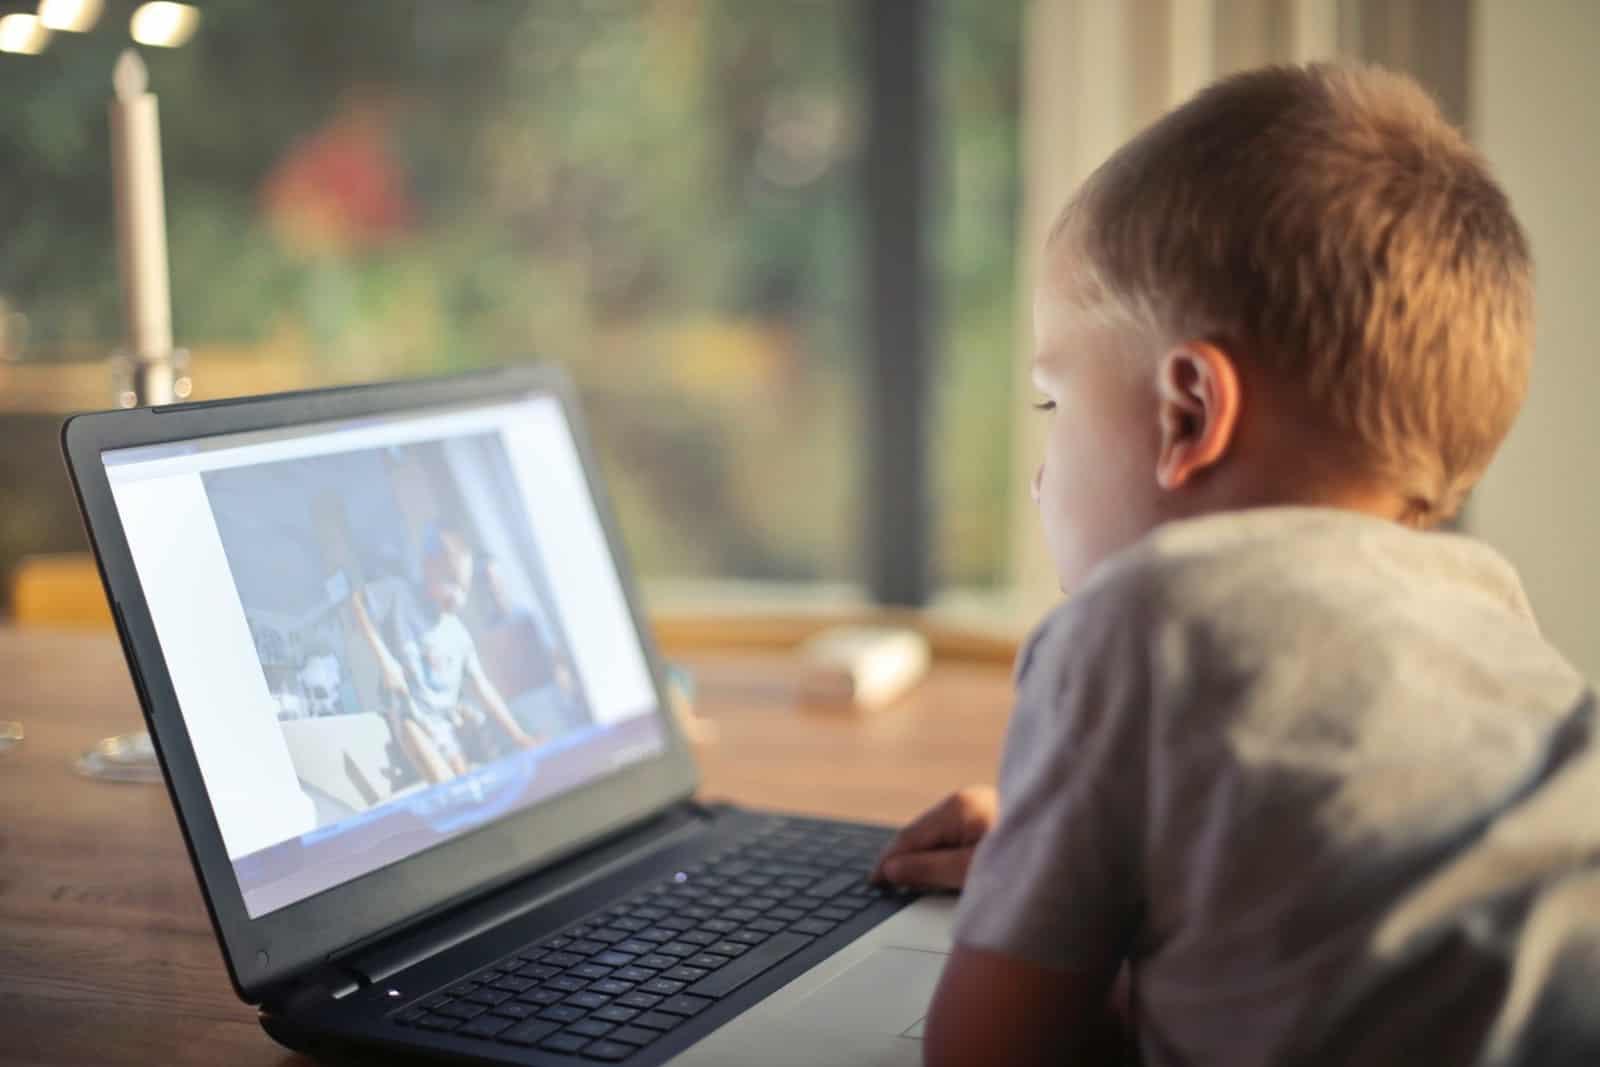 Boy watching a video